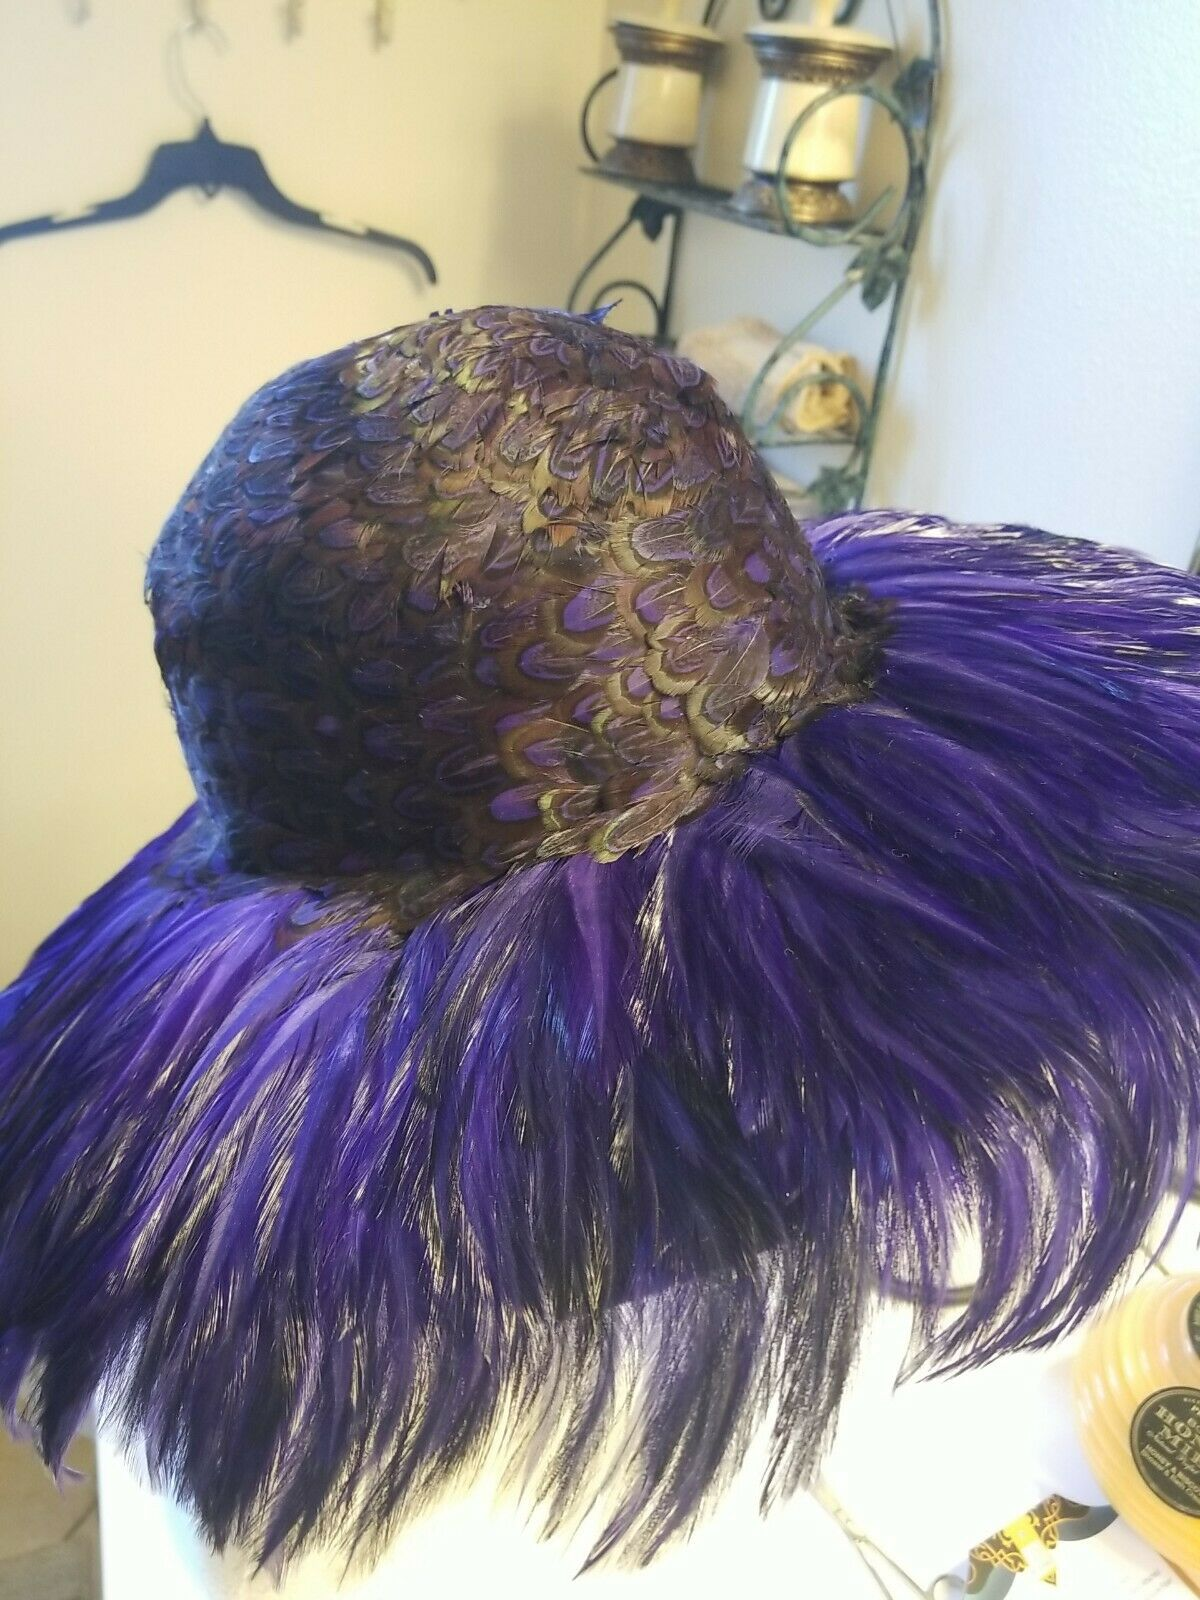 2 Vintage Jack McConnell Hat Feathers Purple. Drk Green pheasant.1 purple R-St